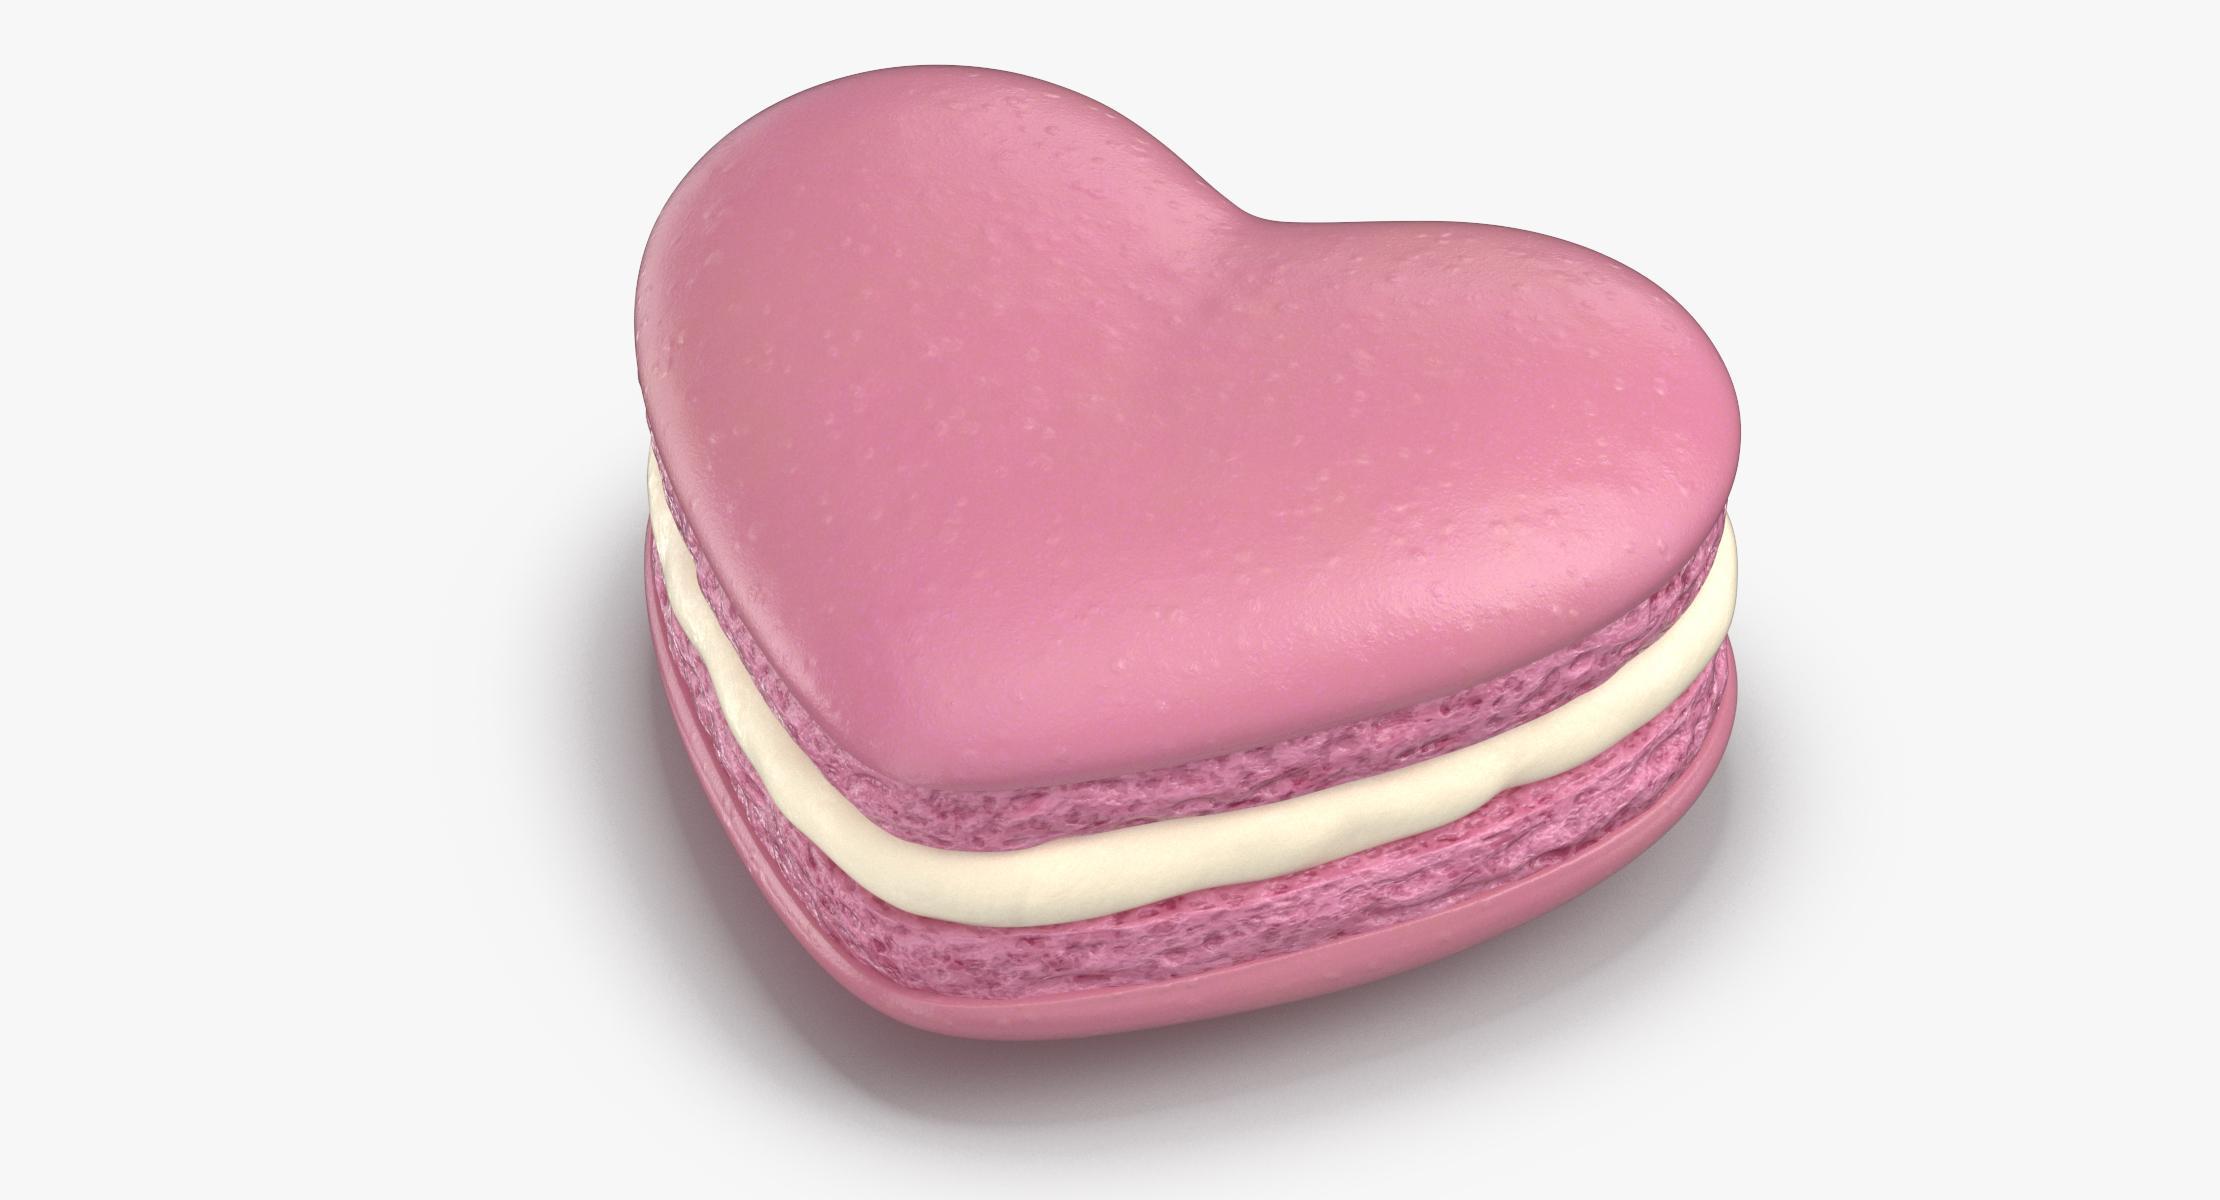 Heart Macaron - reel 1